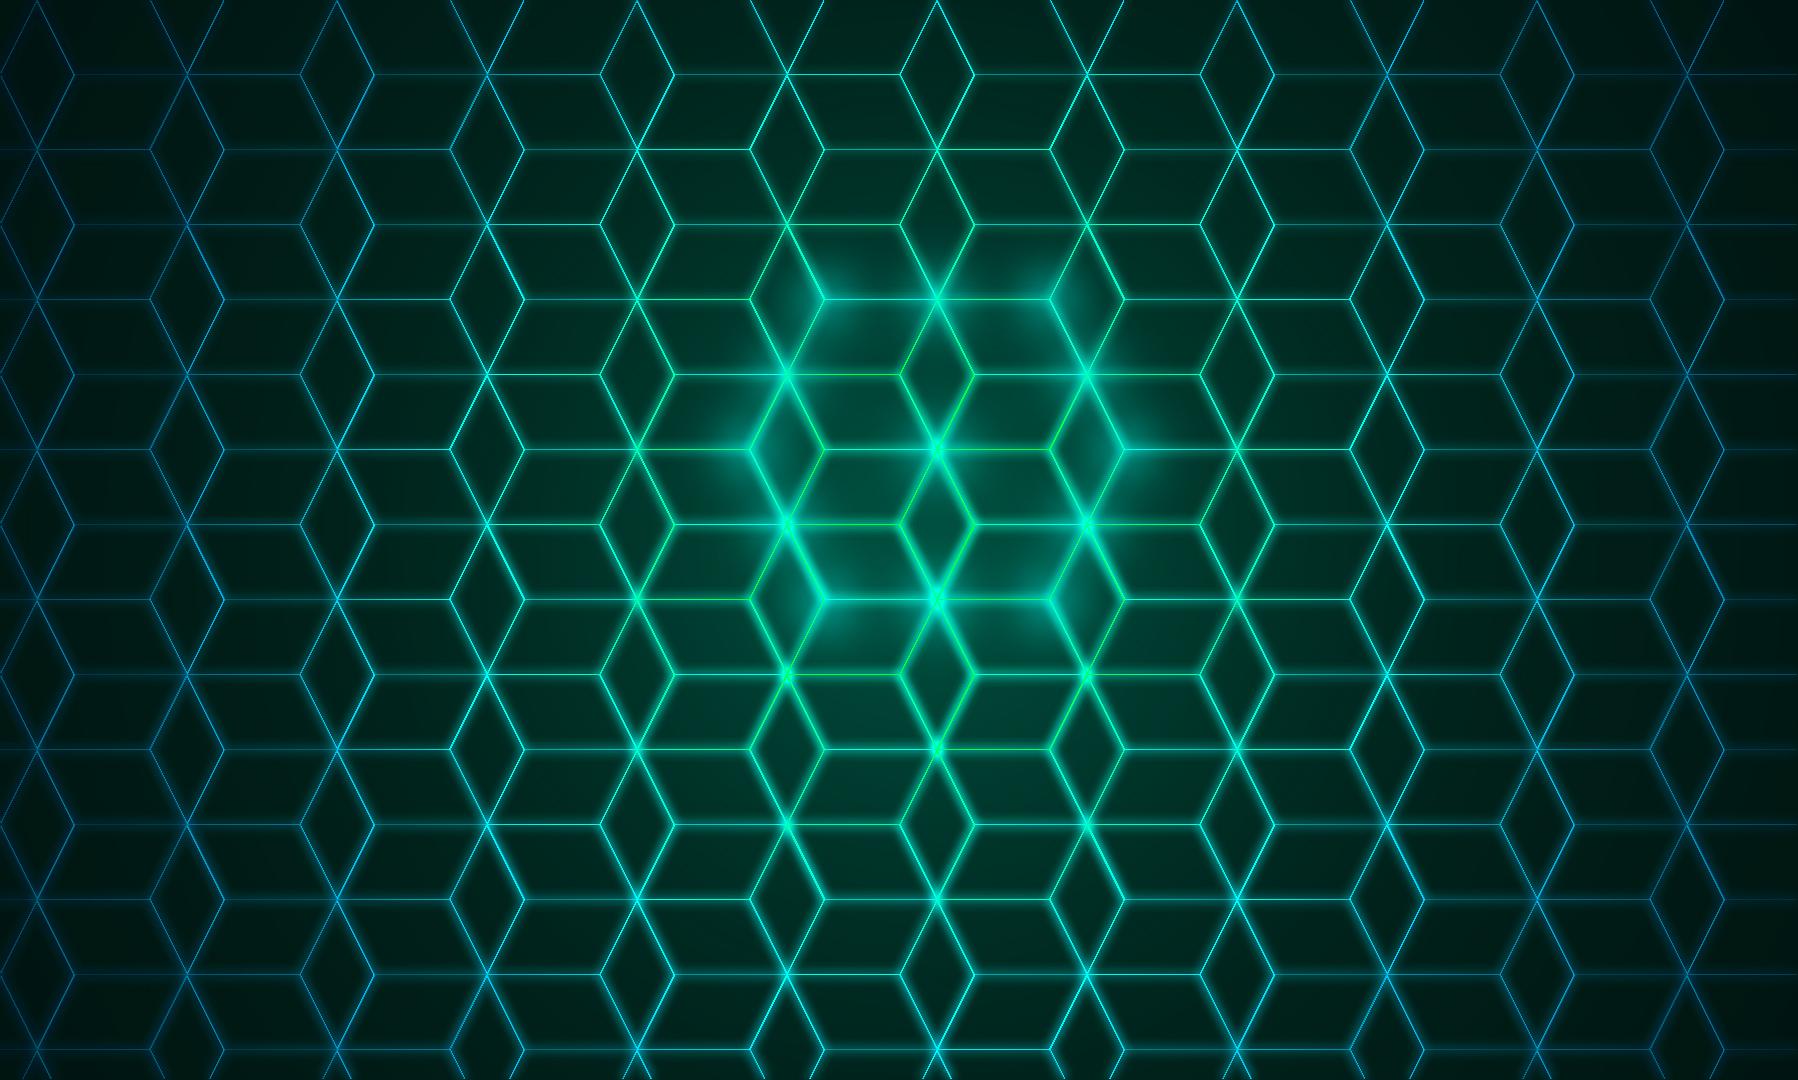 Neon Lights Wallpaper : Neon Lights Wallpaper by wil1295 on DeviantArt